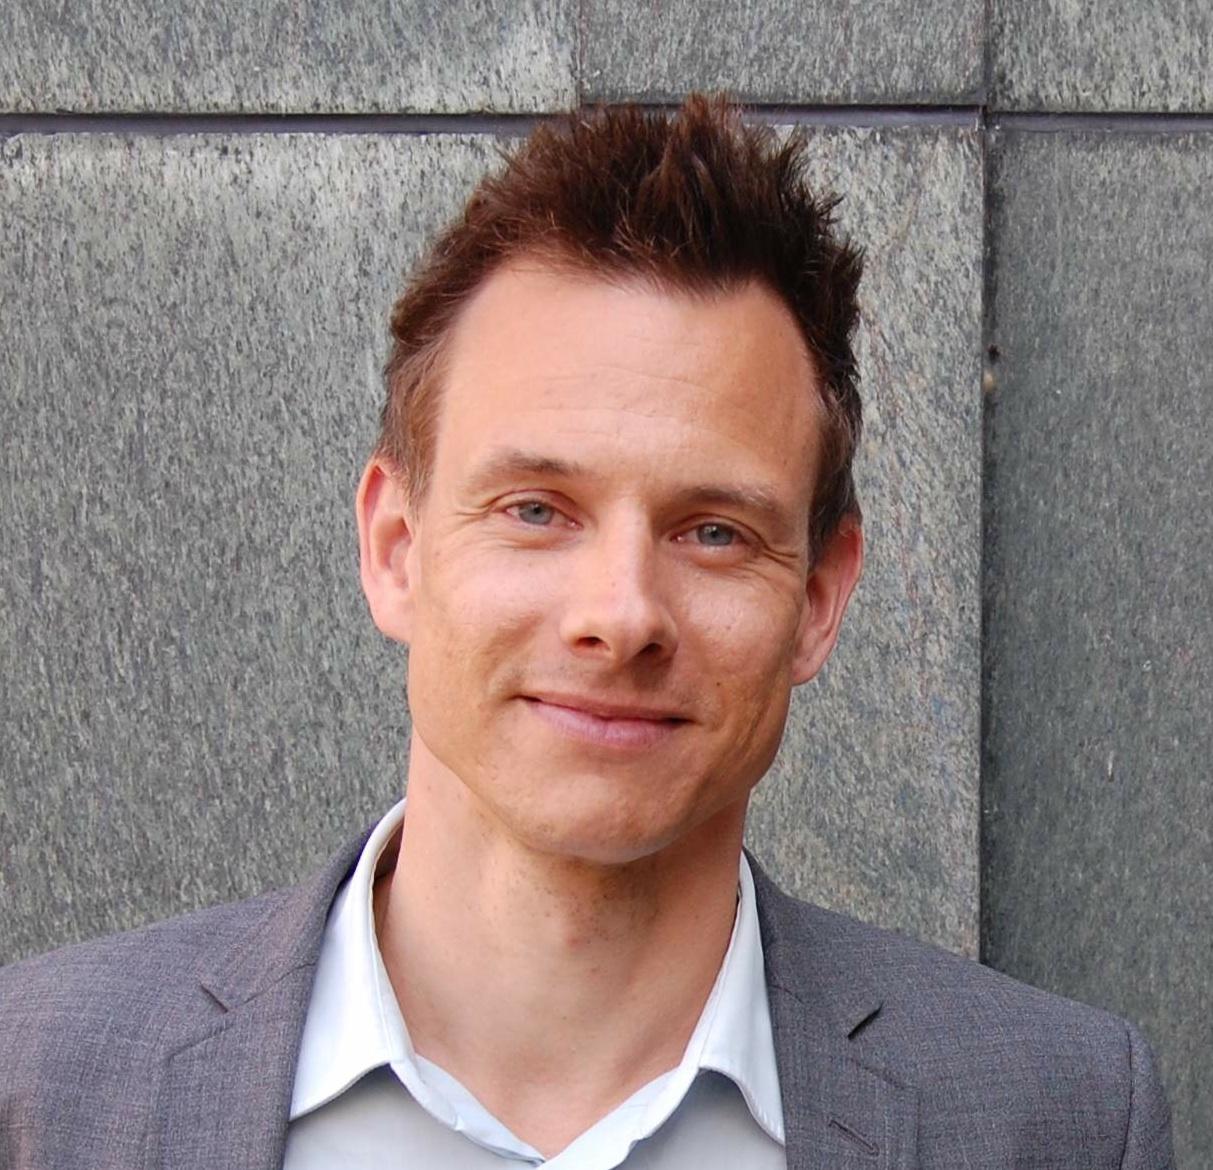 Christian Bason, Director of MindLab